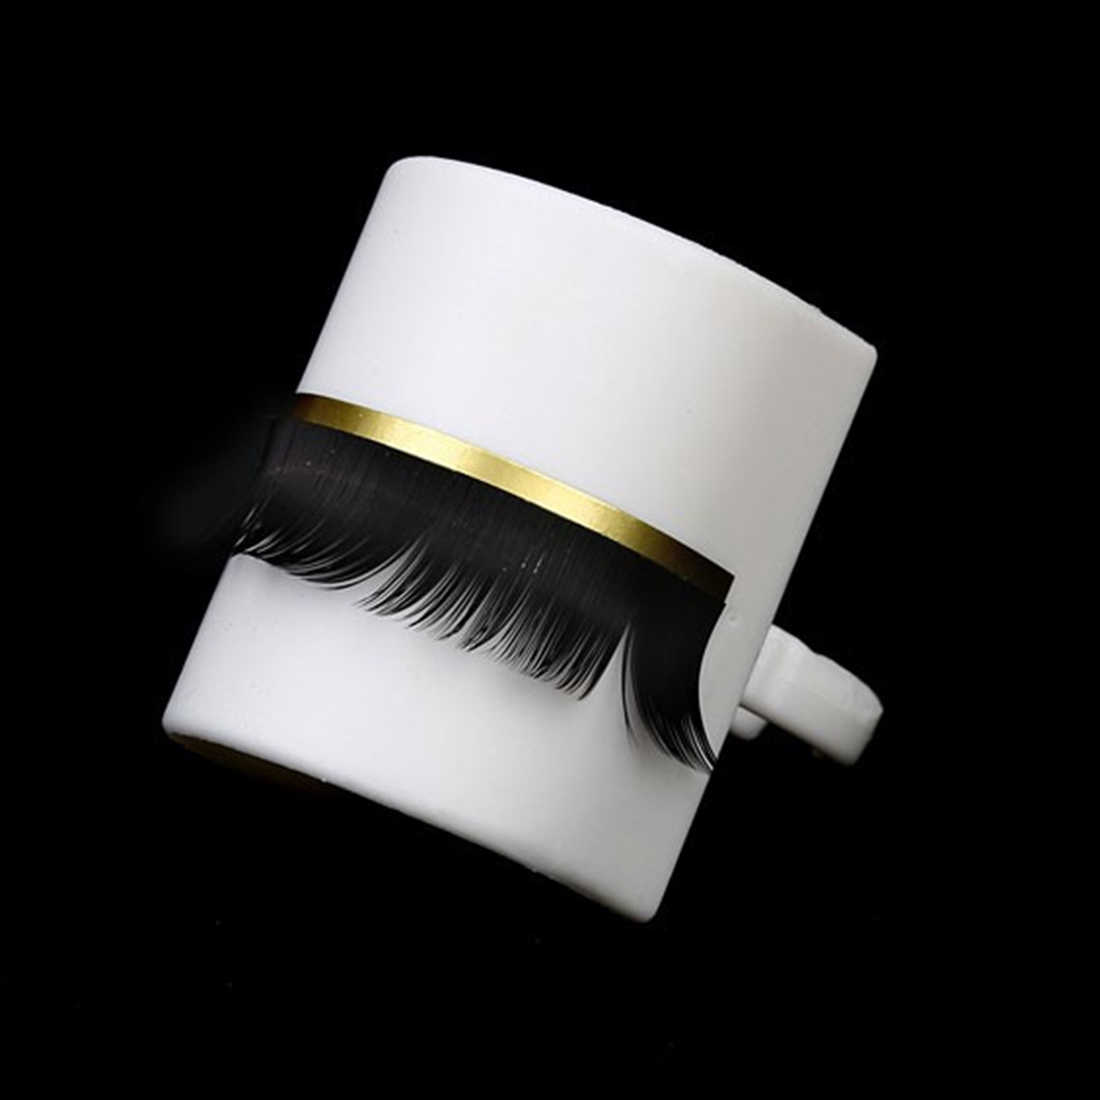 Wimpern Verlängerung Kleber Ring Palette Halter Ring Halter Klebstoff Individuelle Wimpern Stehen Separate Lash U Geformt Make-Up-Tool